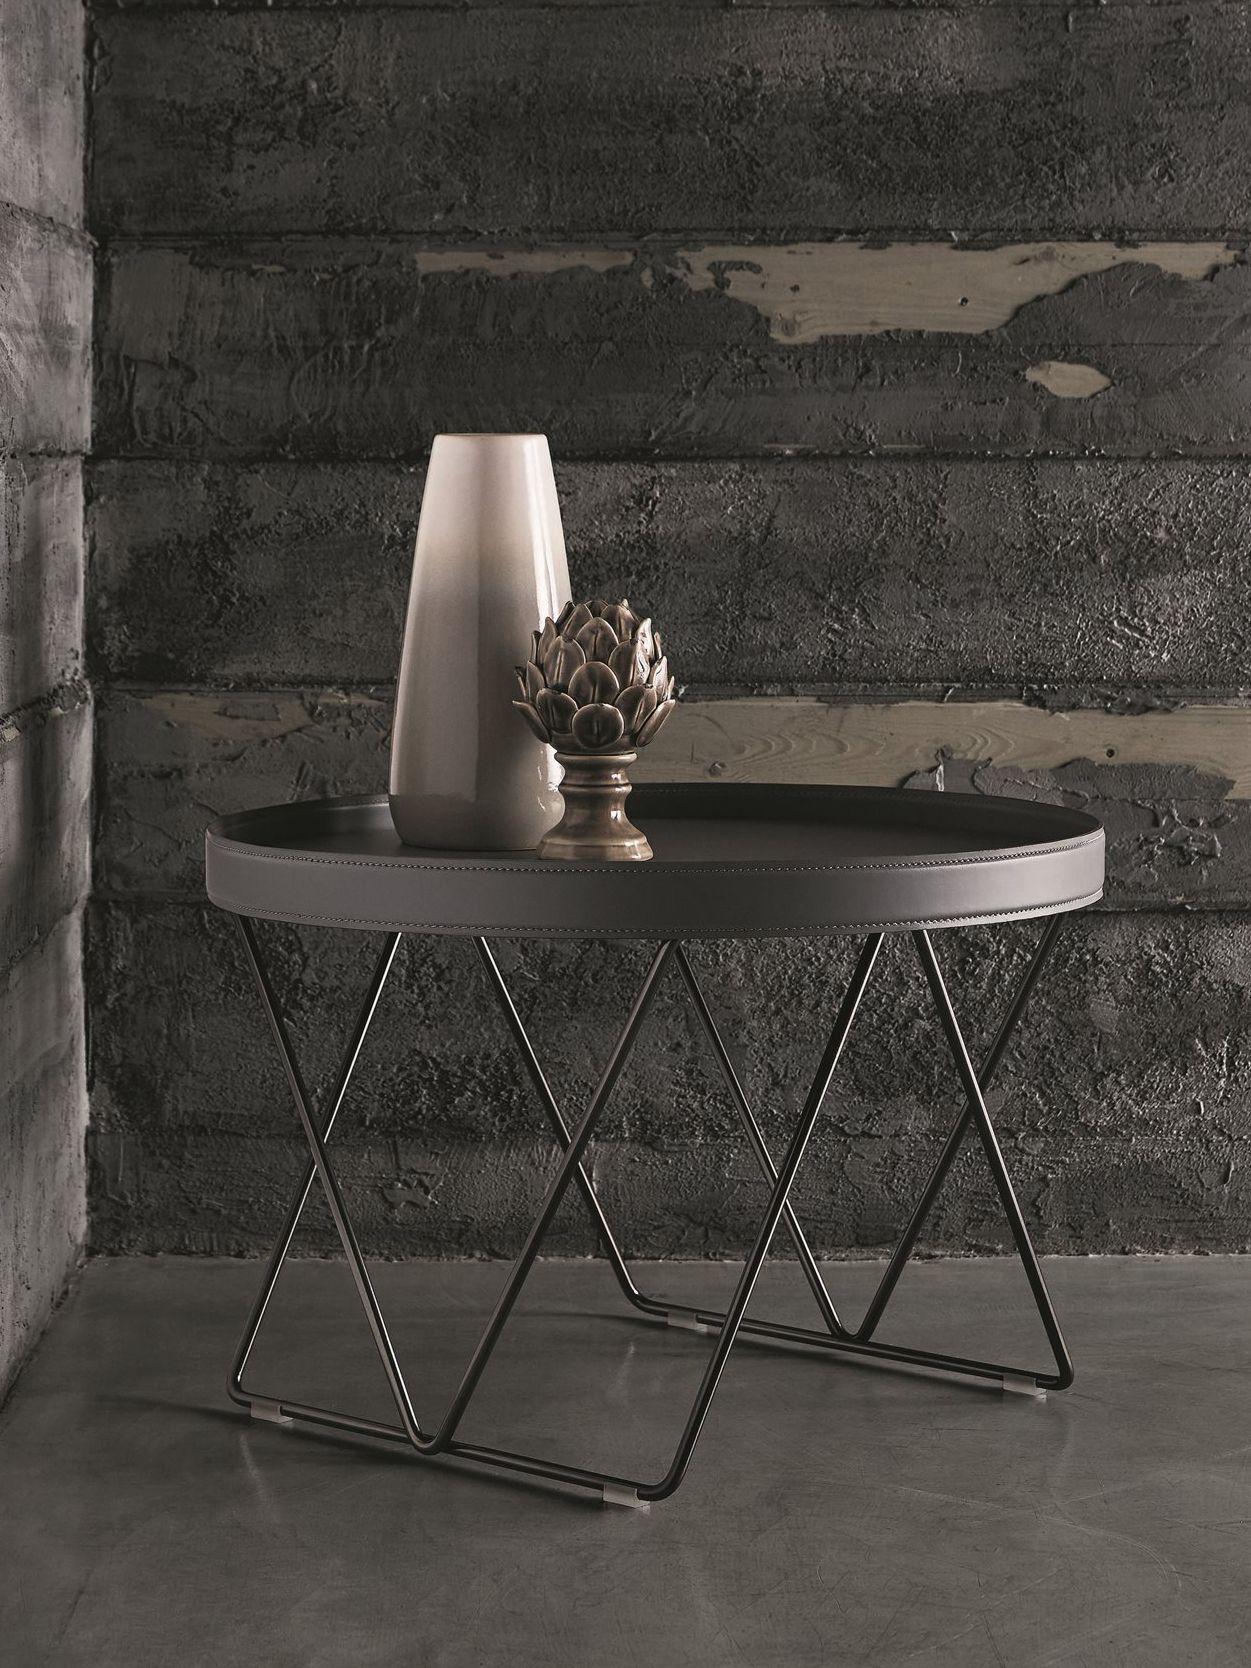 Bontempi Flexus Natural Silver Anthracite Round Coffee Table Round Coffee Table Coffee Table Table [ 1668 x 1251 Pixel ]